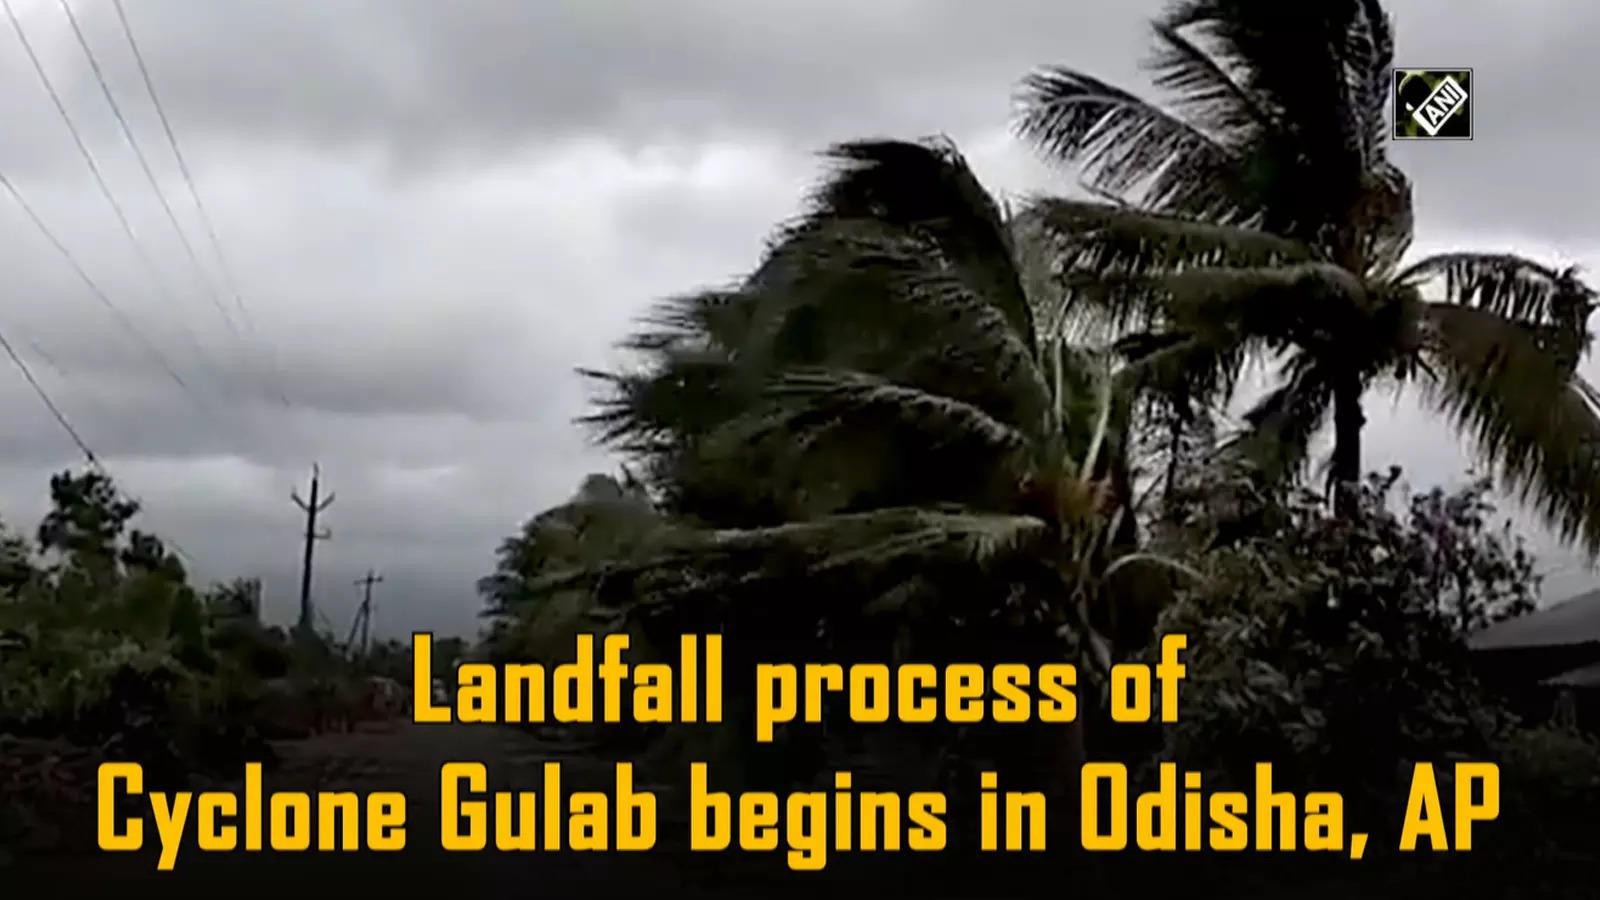 landfall-process-of-cyclone-gulab-begins-in-odisha-ap